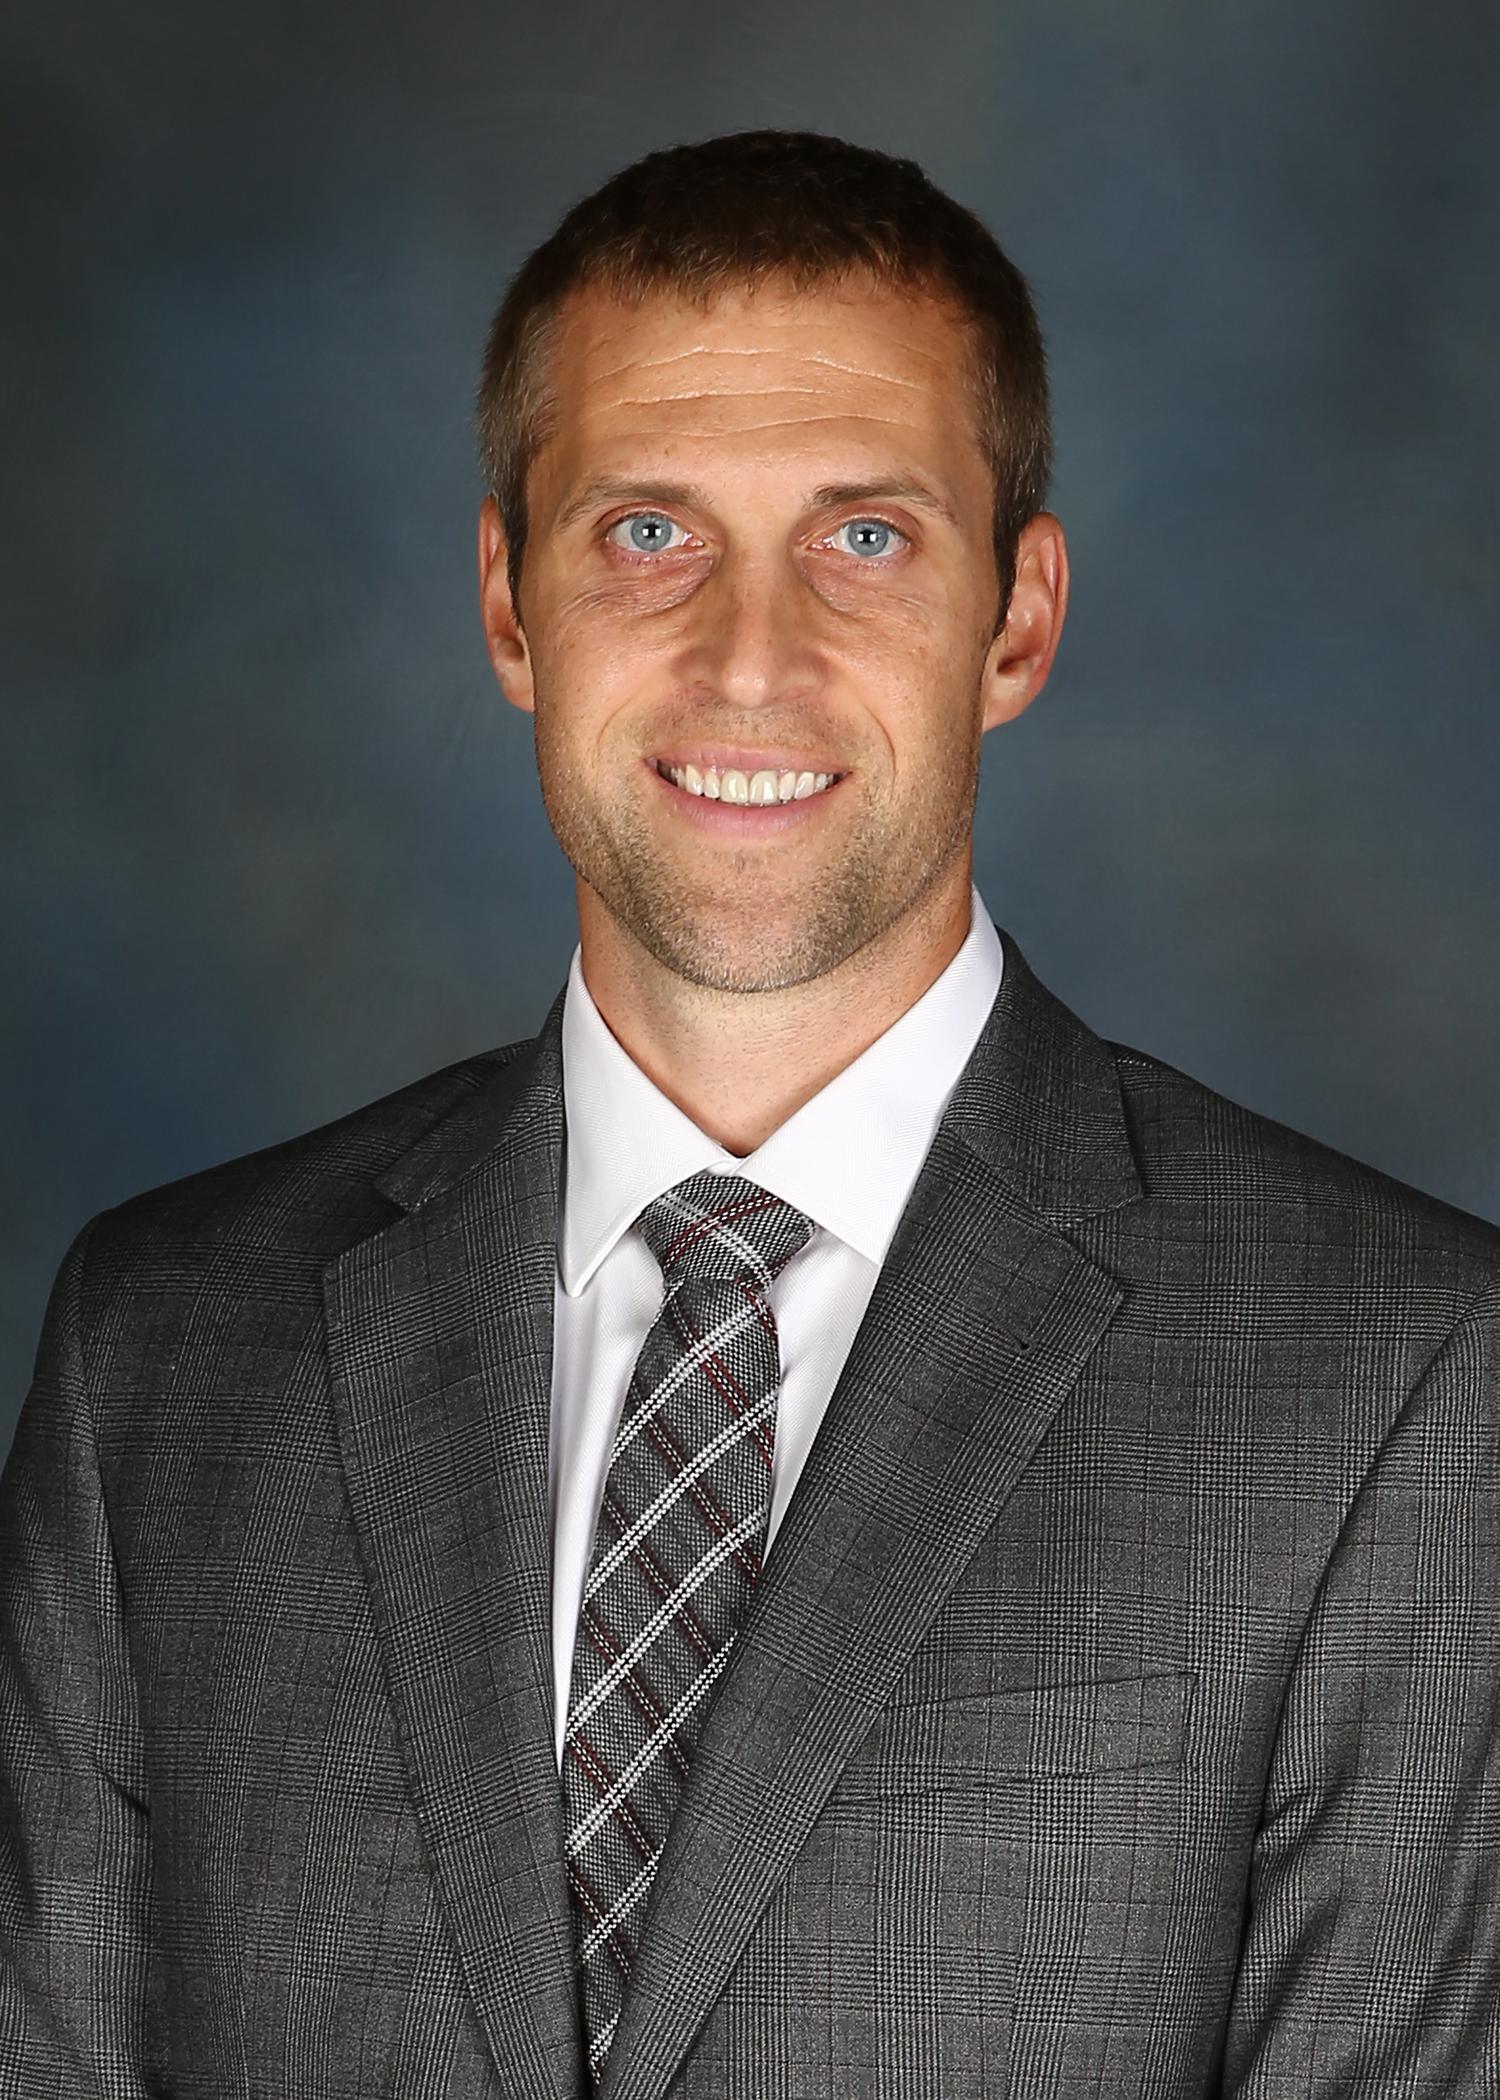 Chris Poore - Head Coach